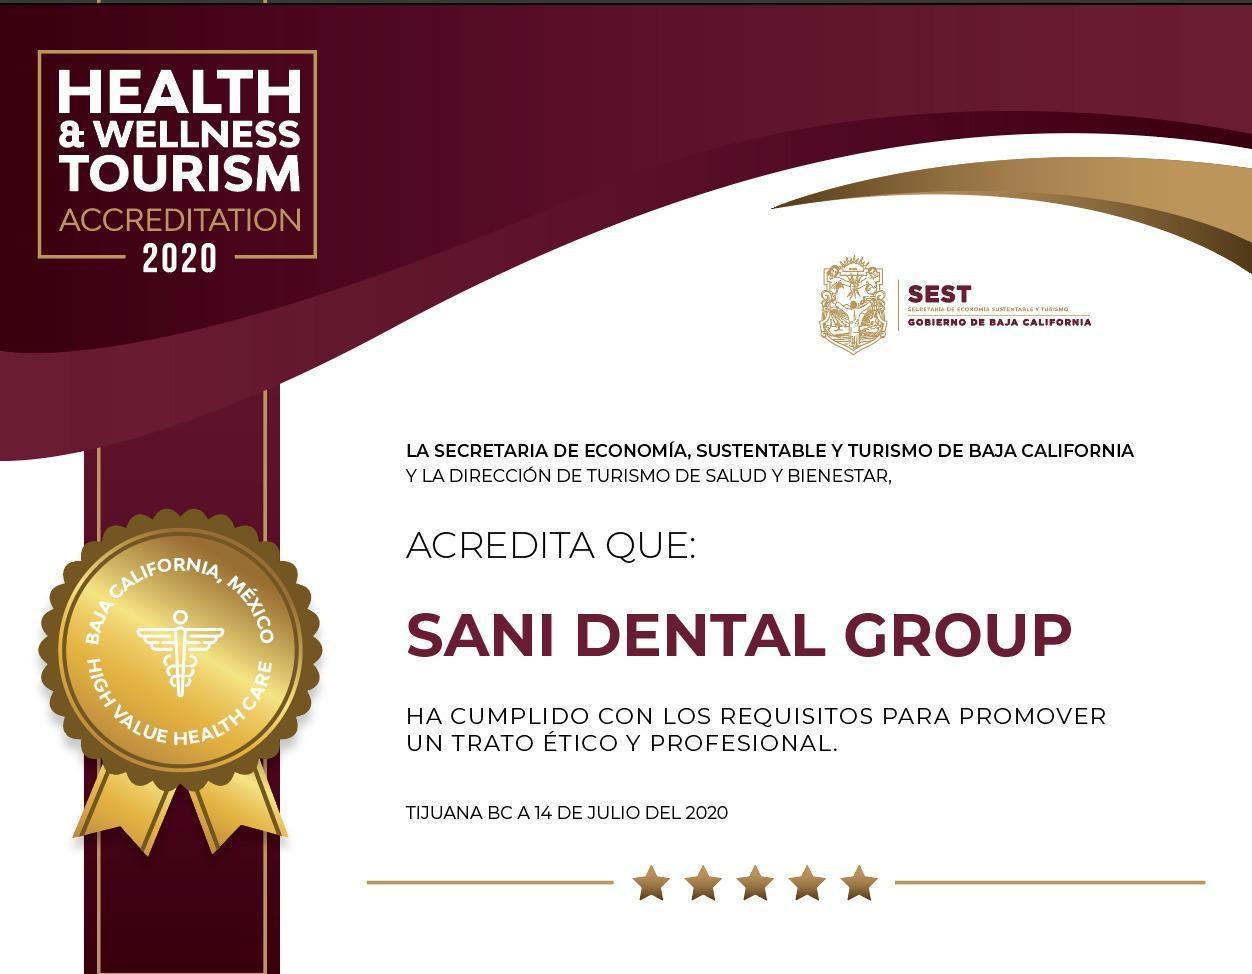 health-wellness-tourism